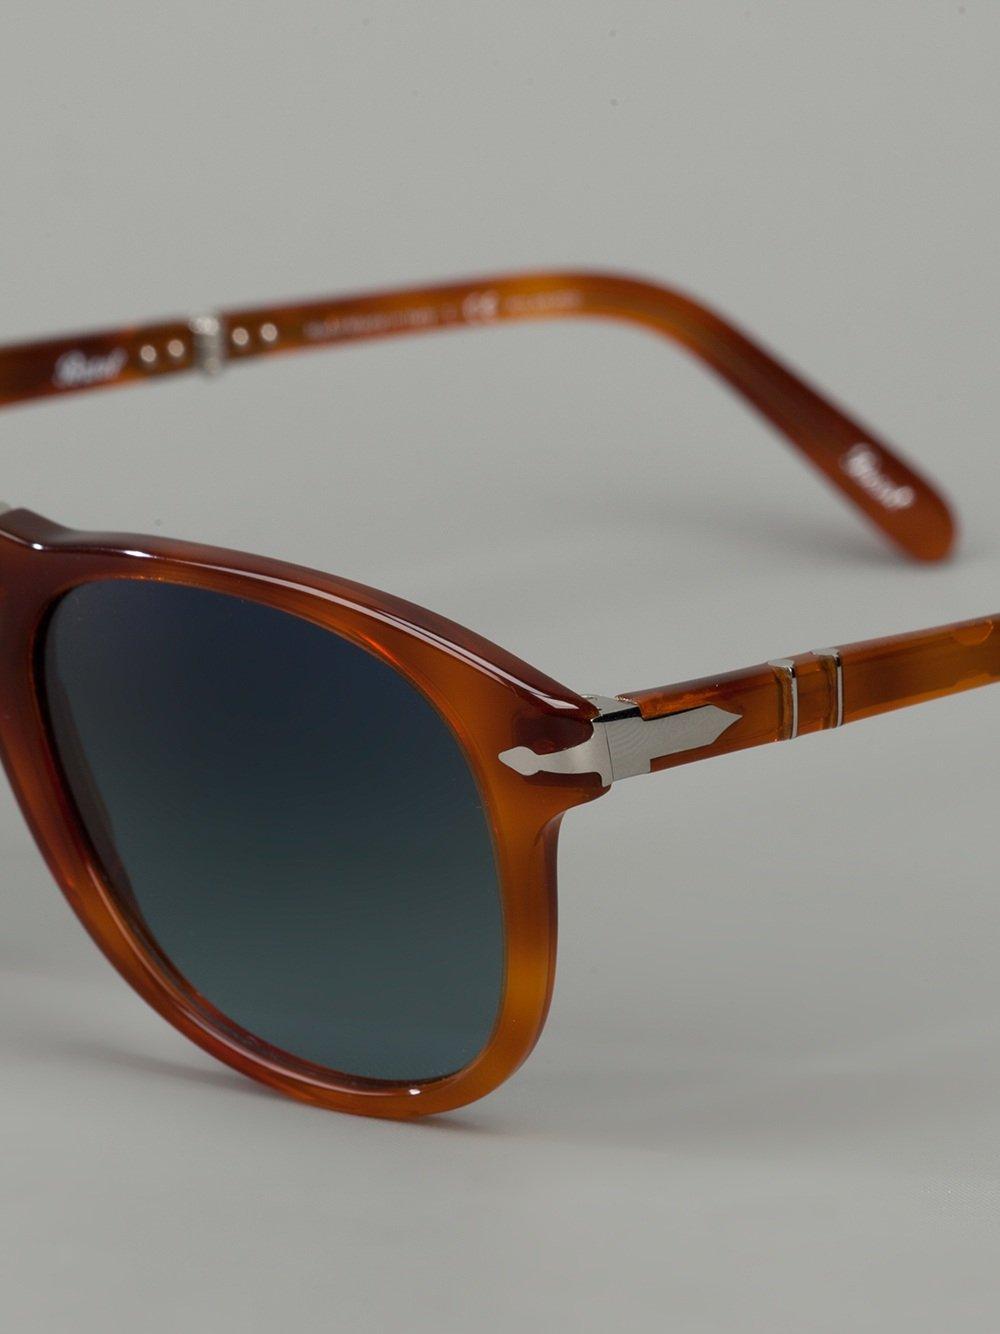 9e03edad2d Persol Steve Mcqueen Folding Sunglasses